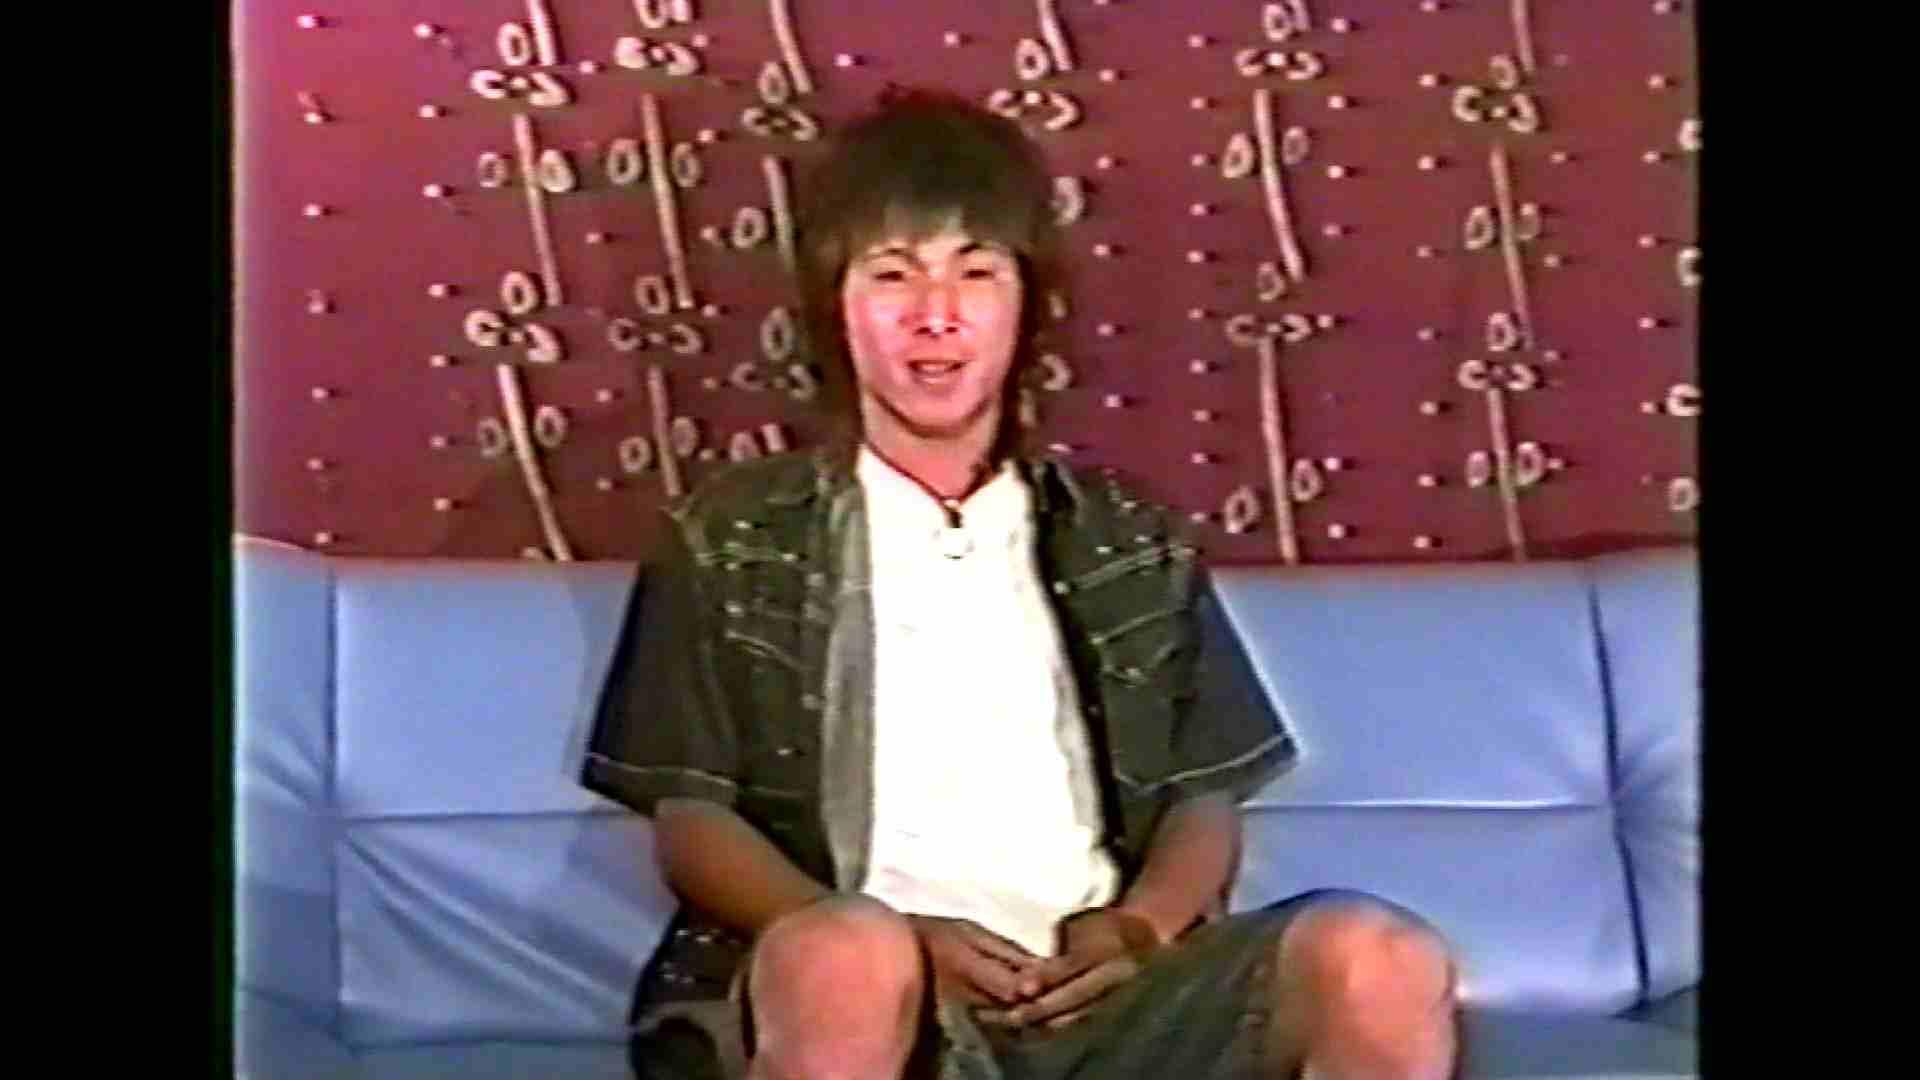 GAYBOY宏のオカズ倉庫Vol.3-1 入浴・シャワー丸見え 男同士画像 98pic 28